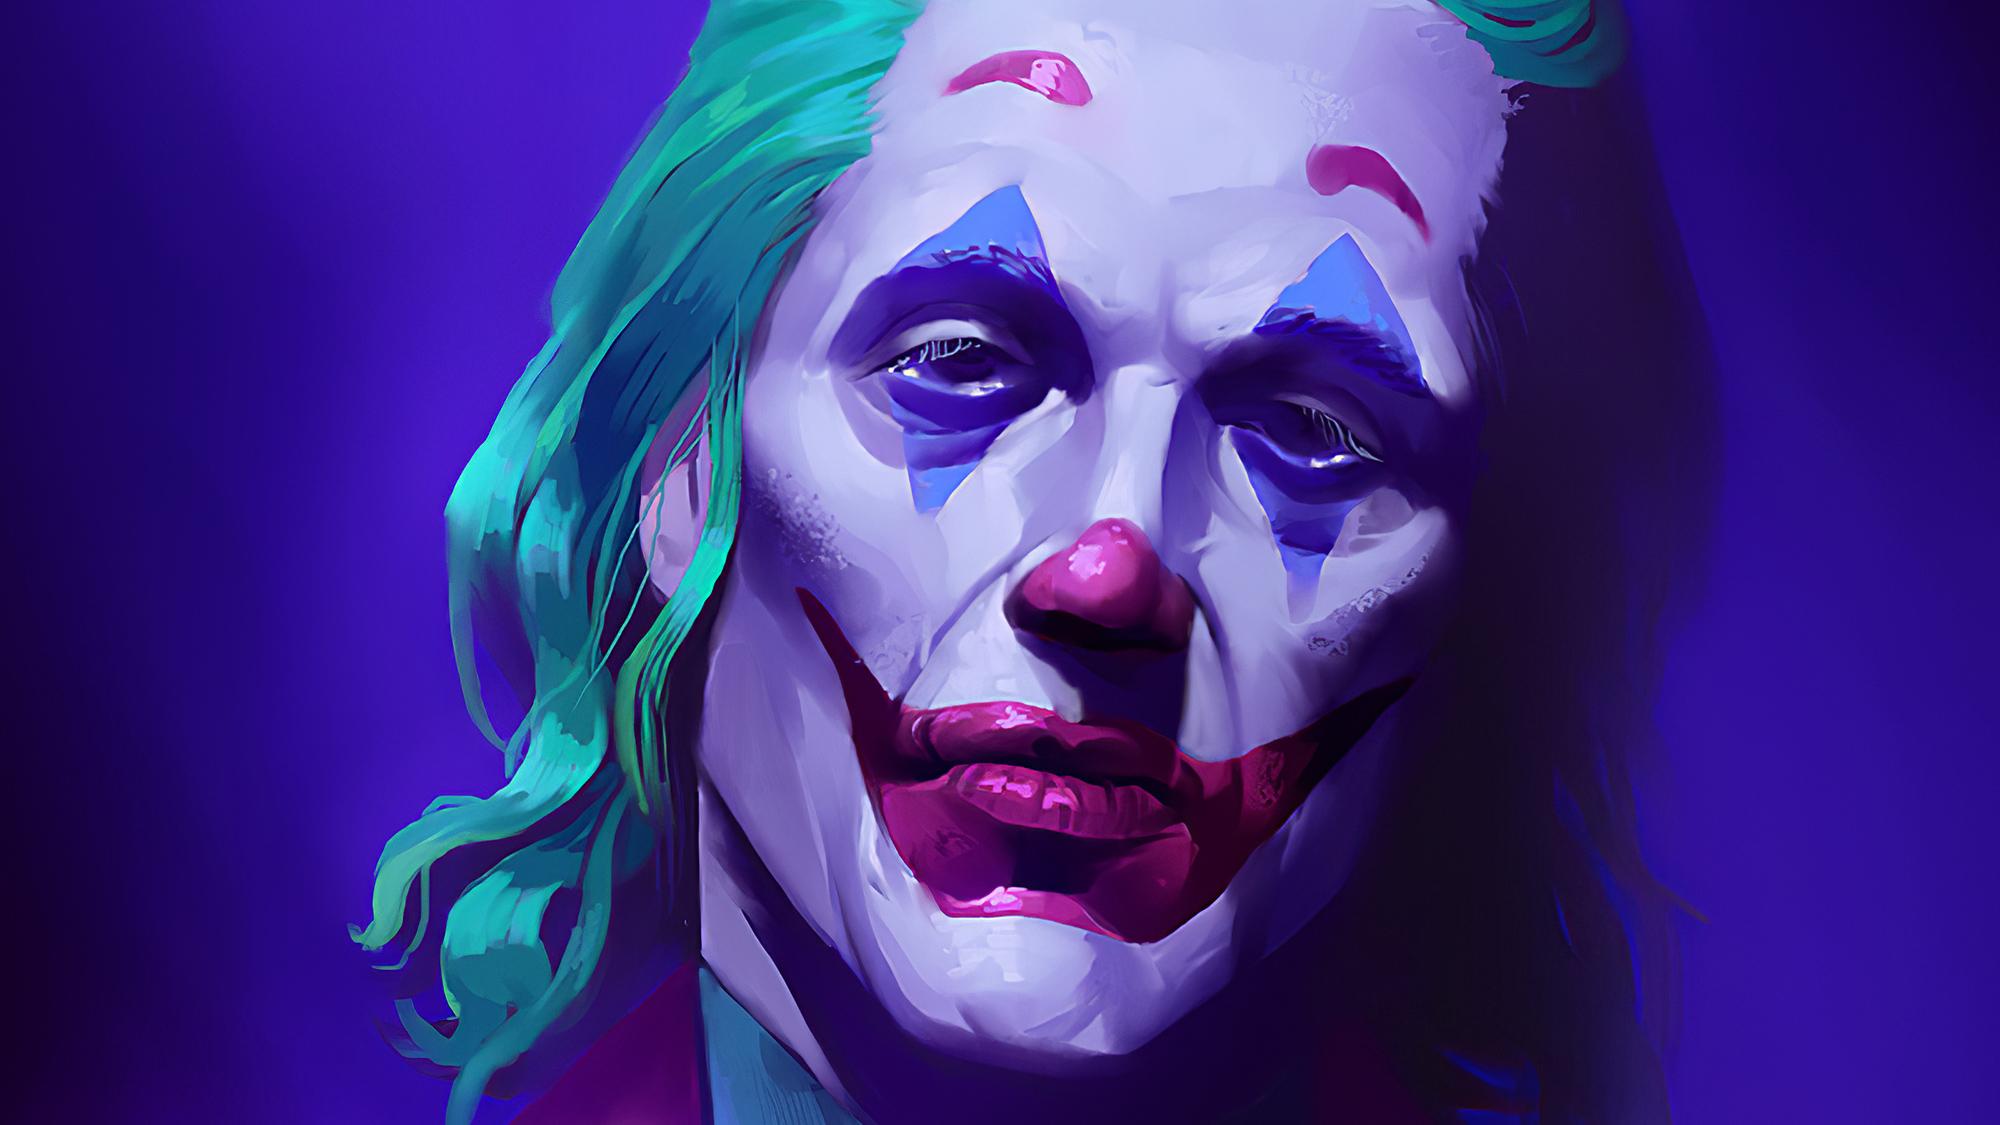 640x1136 Joker 2019 Art Iphone 5 5c 5s Se Ipod Touch Hd 4k